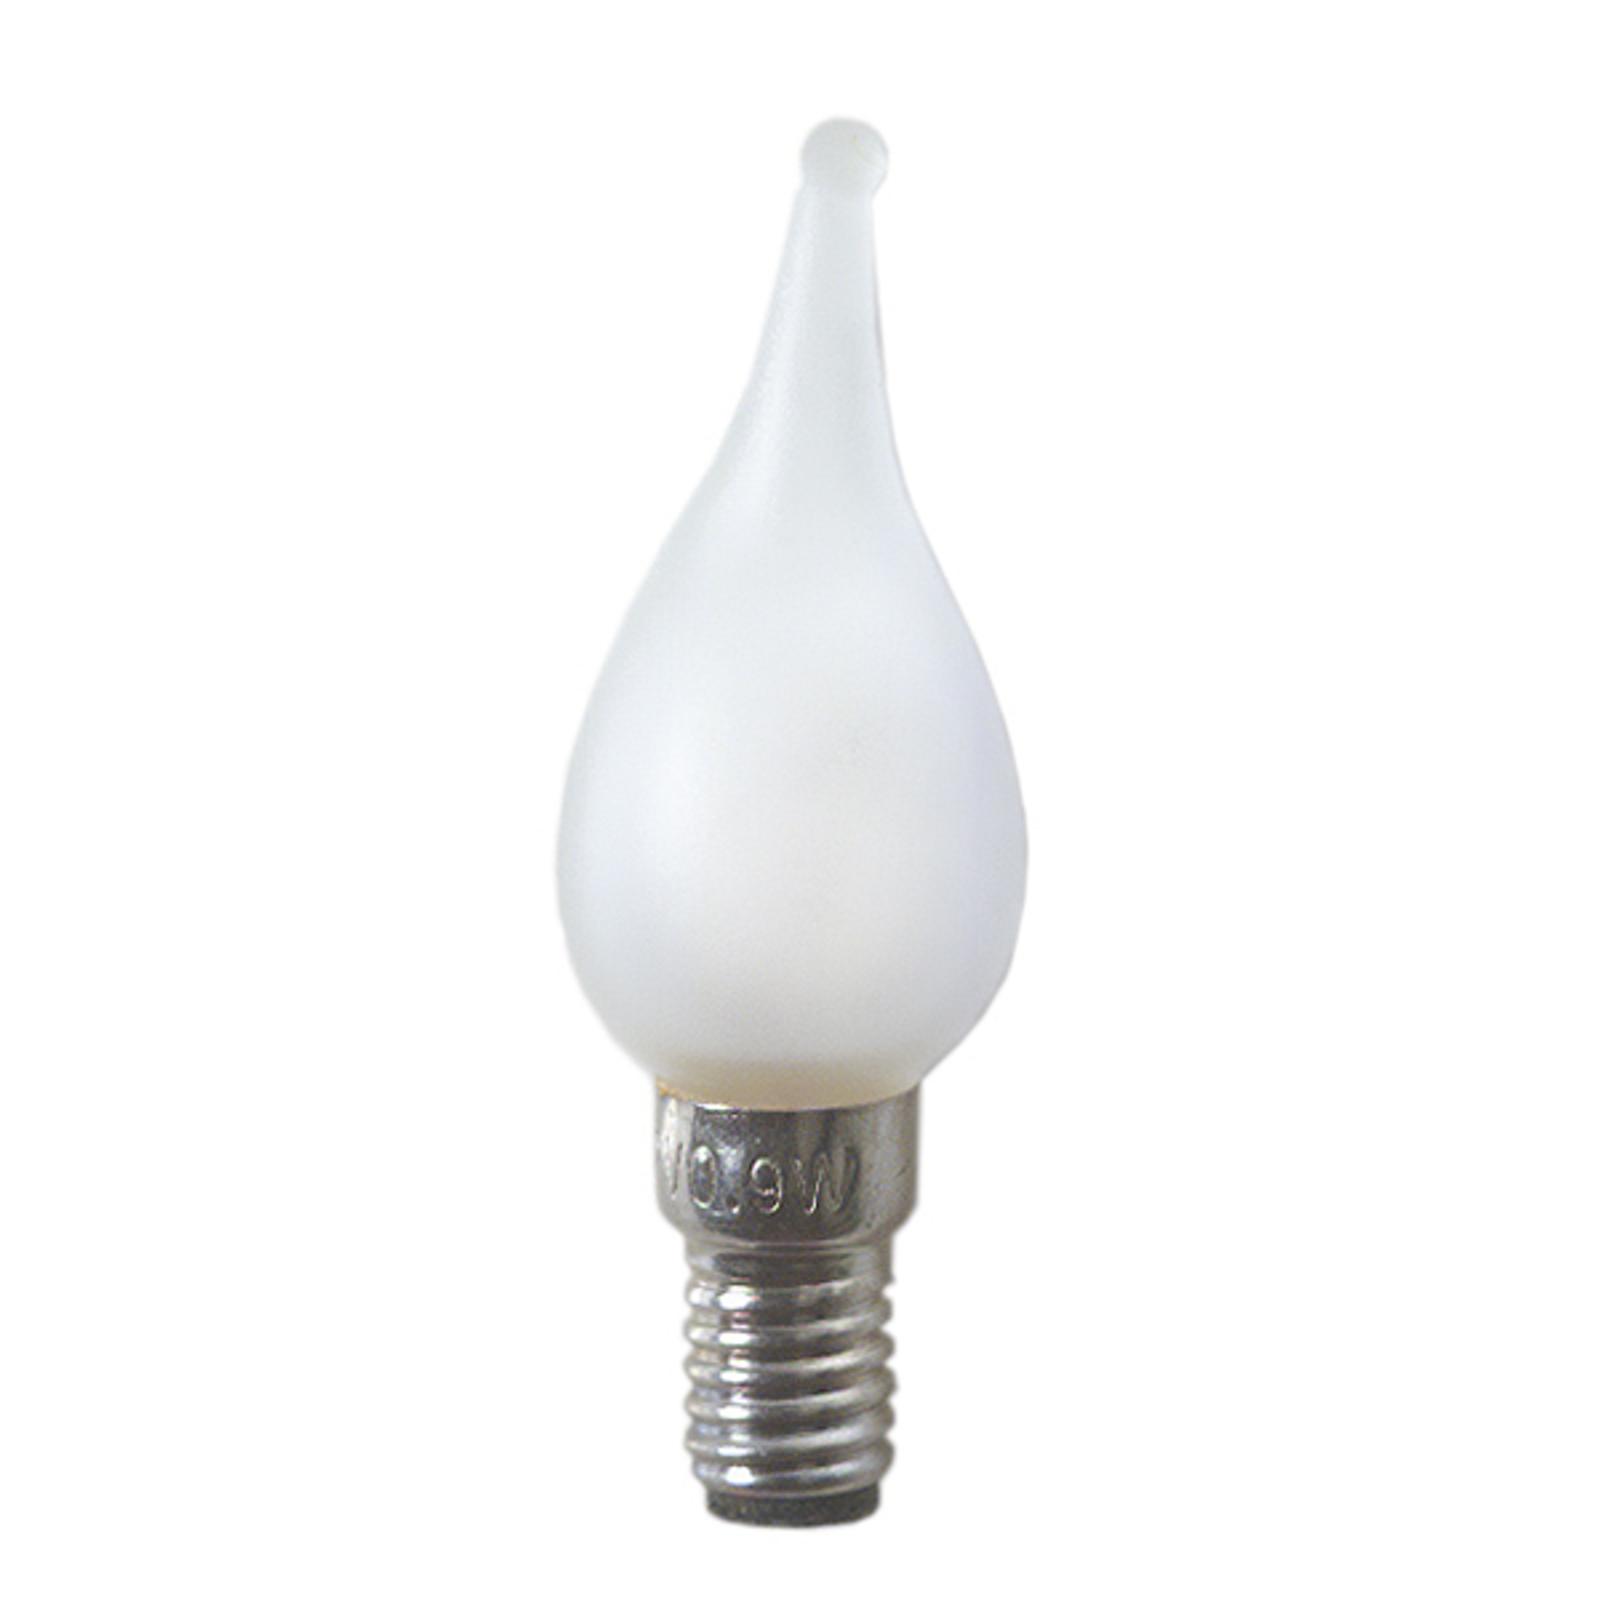 E6 0,9W 12V varalamput NV-ikkunakynttelikköön 3kpl